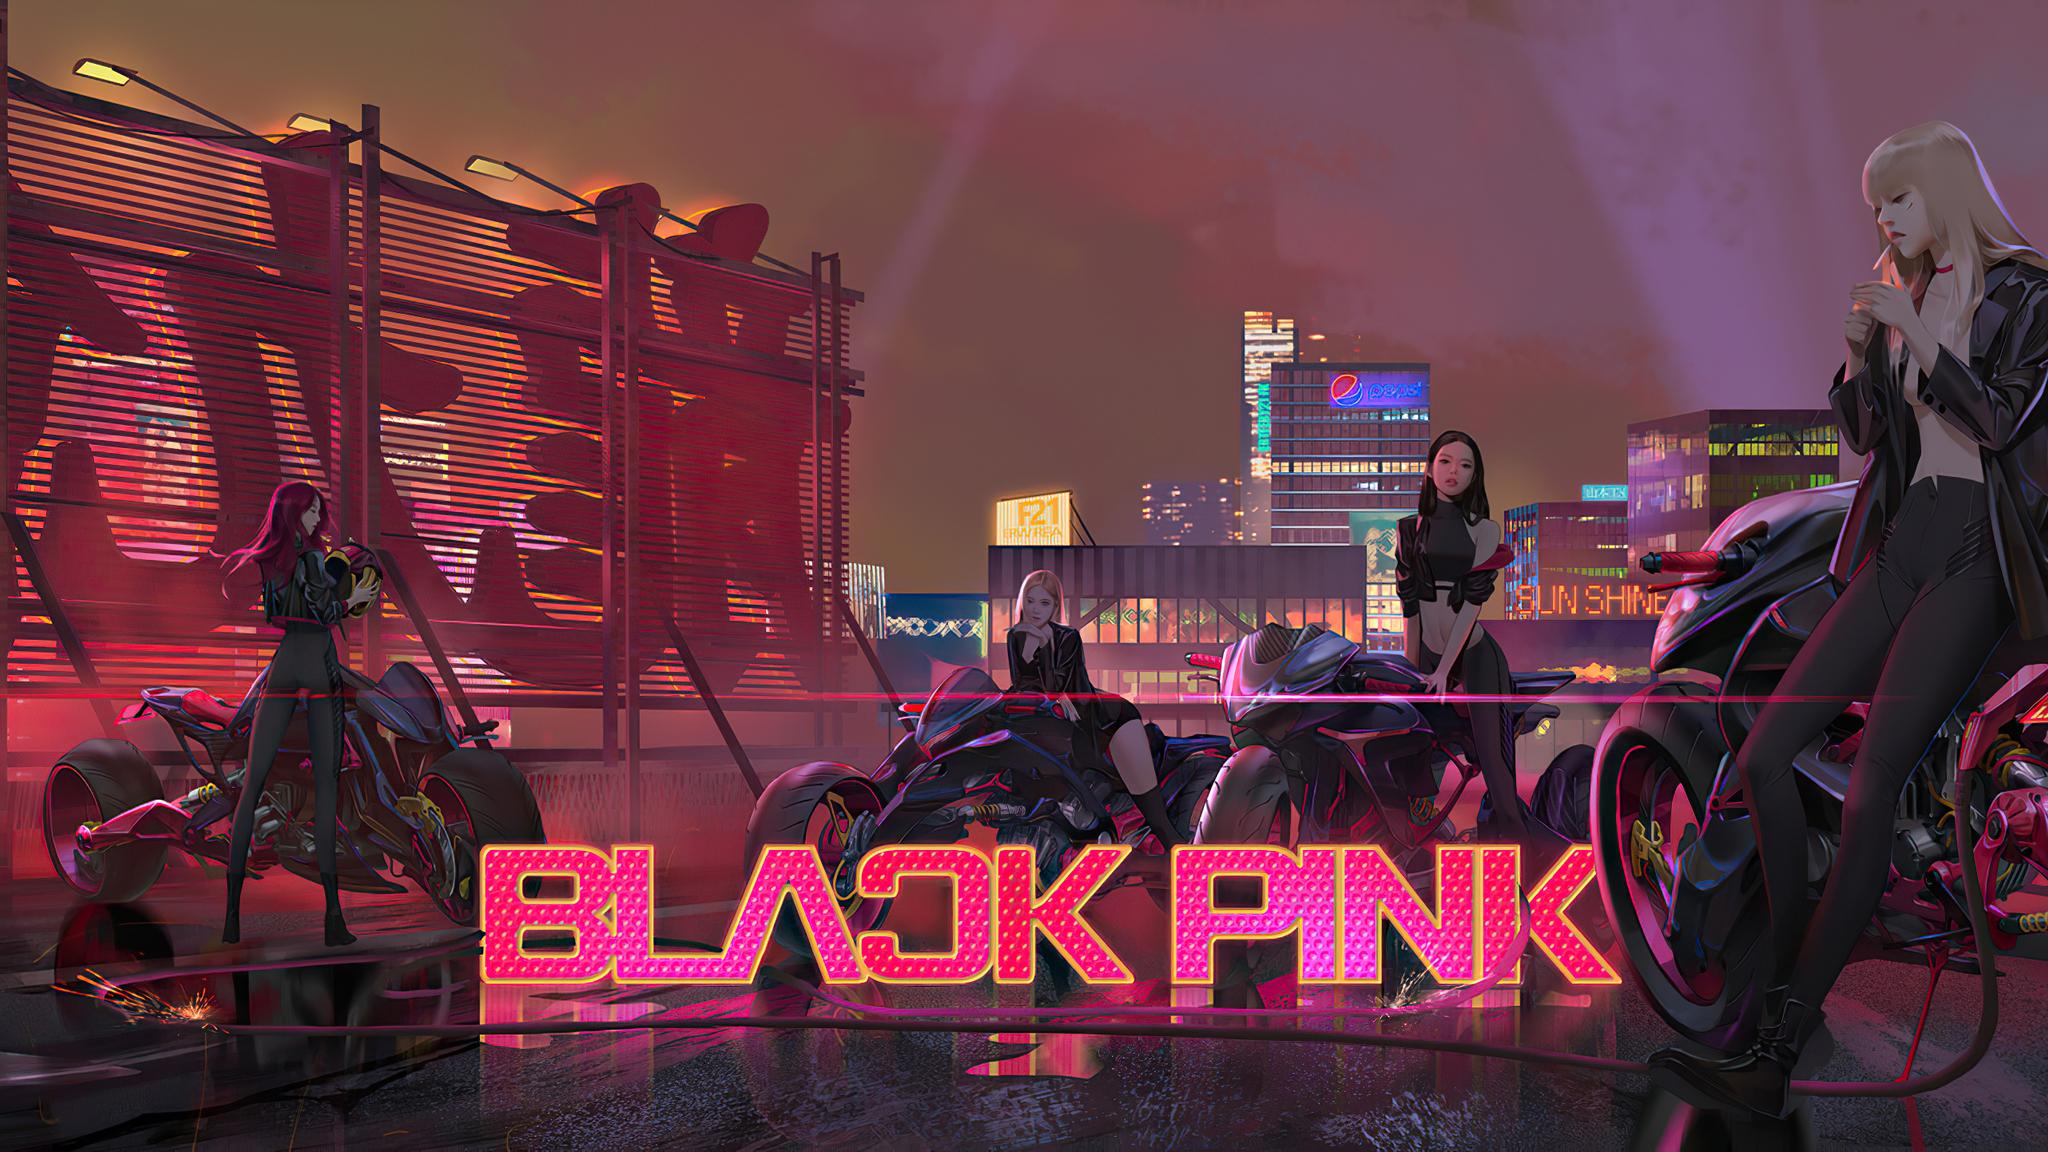 Blackpink Lovesick Girl 4k Wallpaper 2048x1152 Blackpink 4k 2048x1152 Resolution Hd 4k Wallpapers Images Backgrounds Photos And Total Update